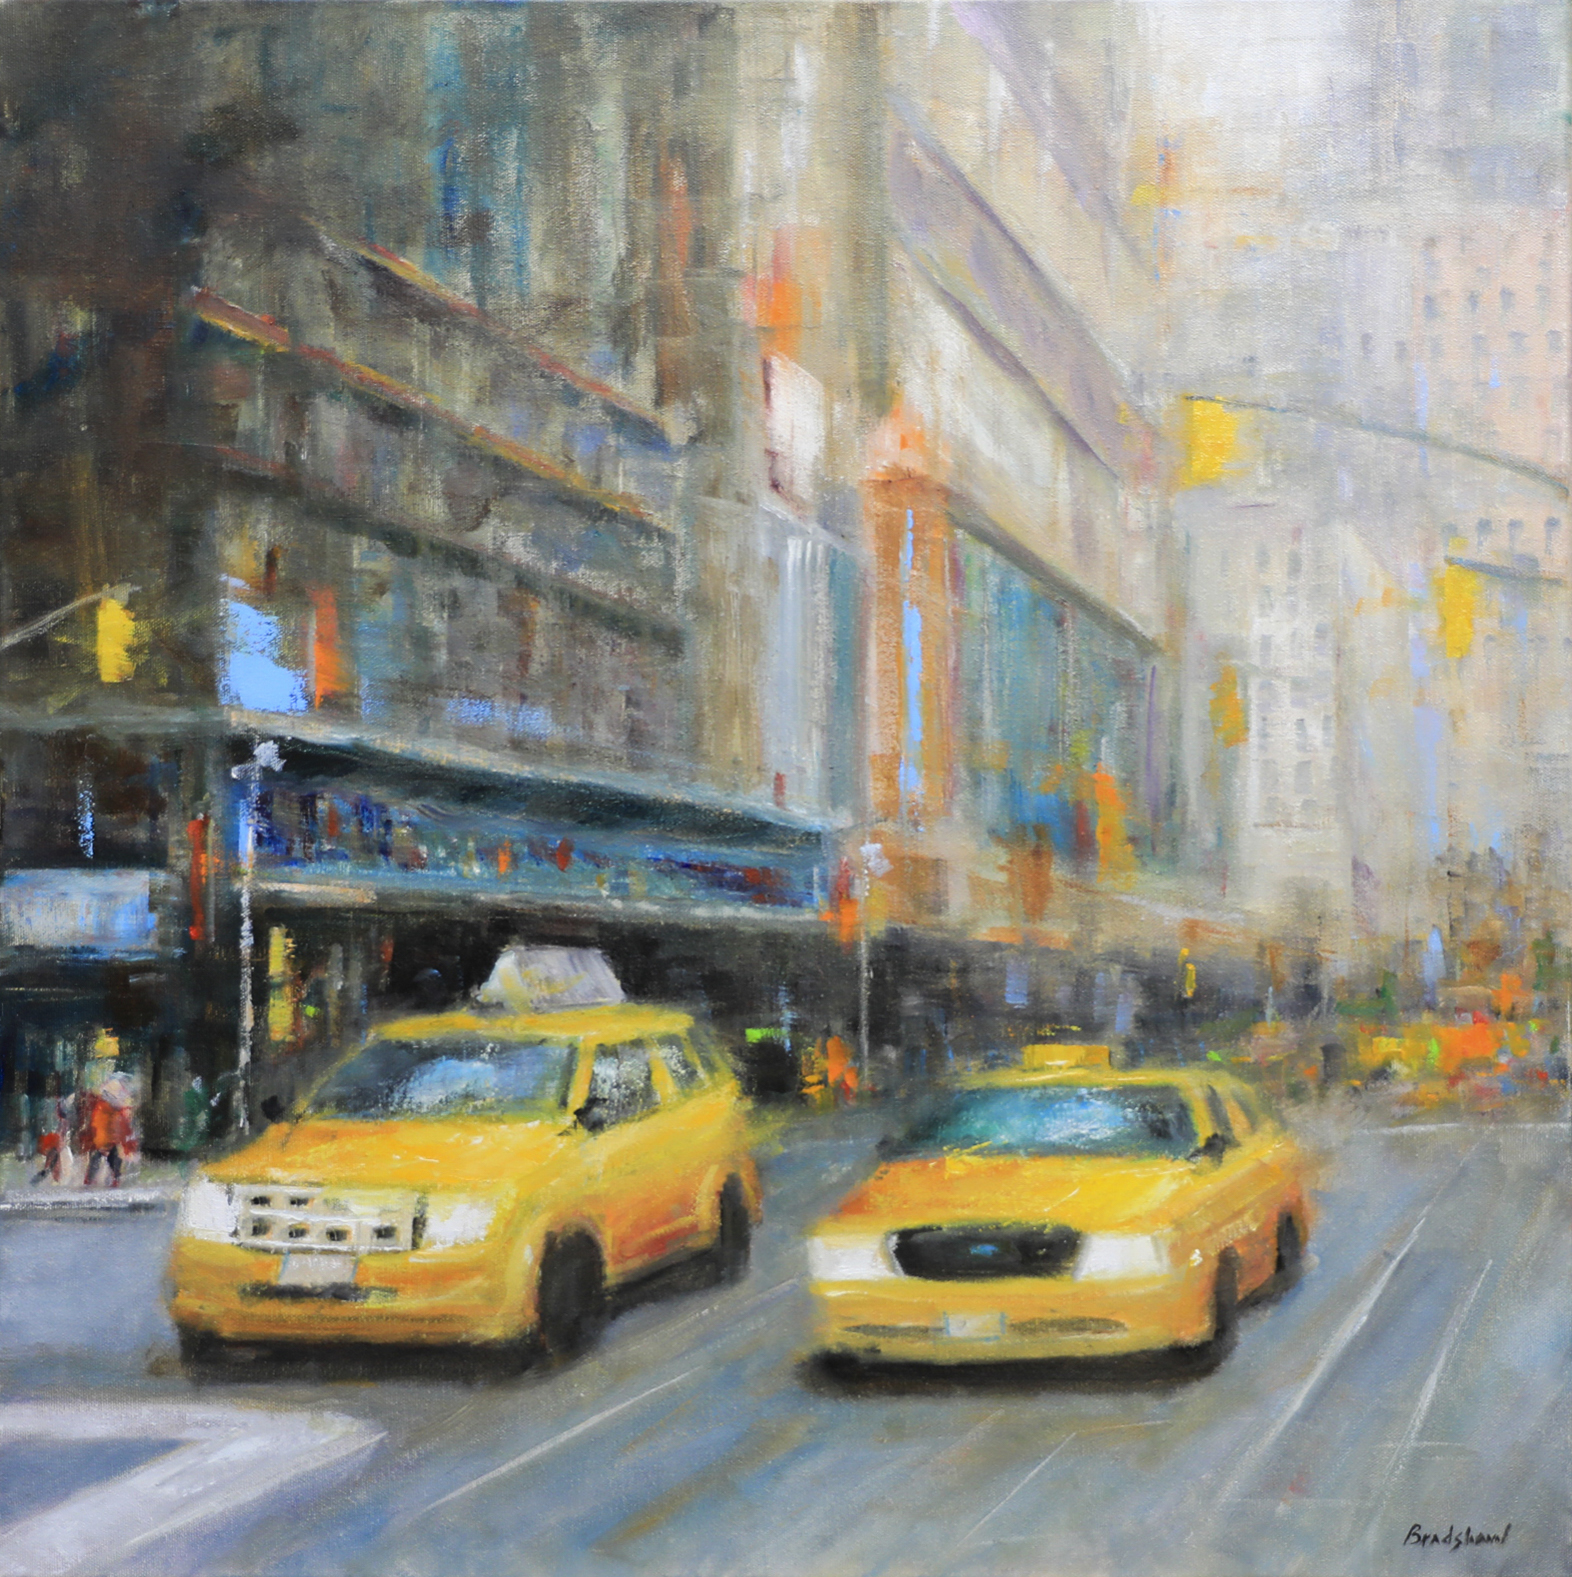 West 23rd Street by  Bob Bradshaw - Masterpiece Online